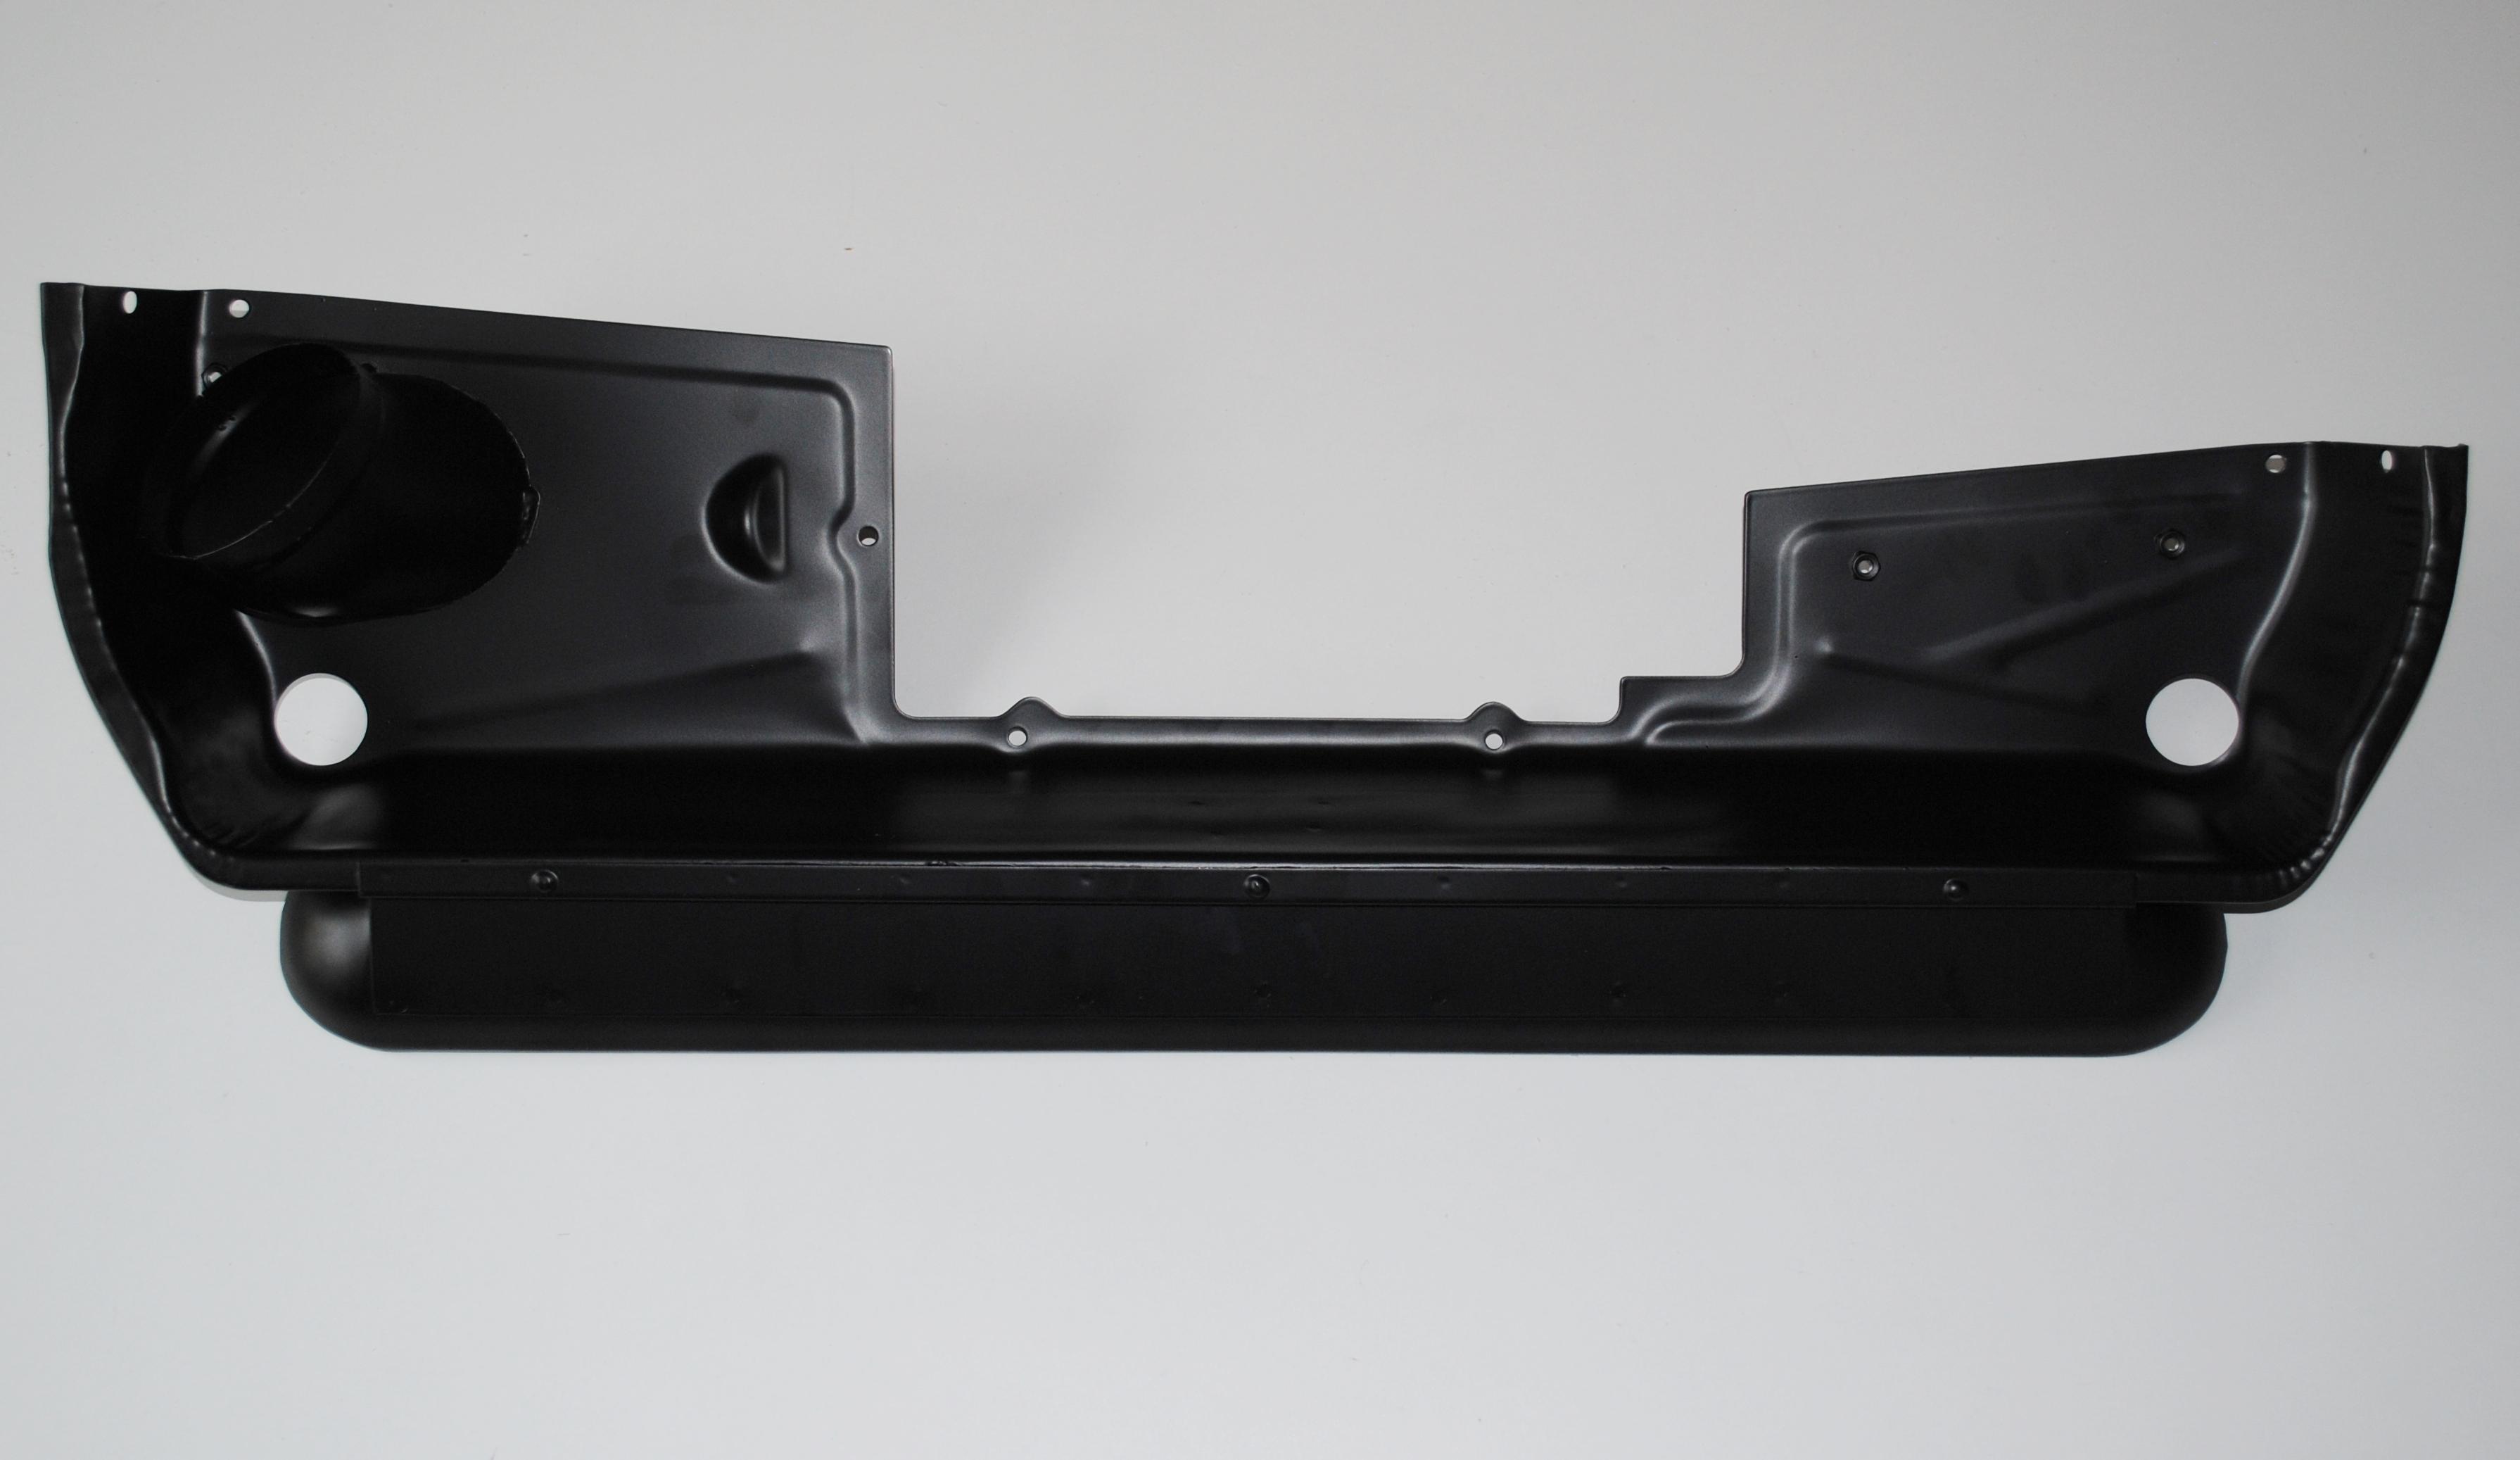 porsche 964 aufkleber motorraum 28 images 911sc how to. Black Bedroom Furniture Sets. Home Design Ideas